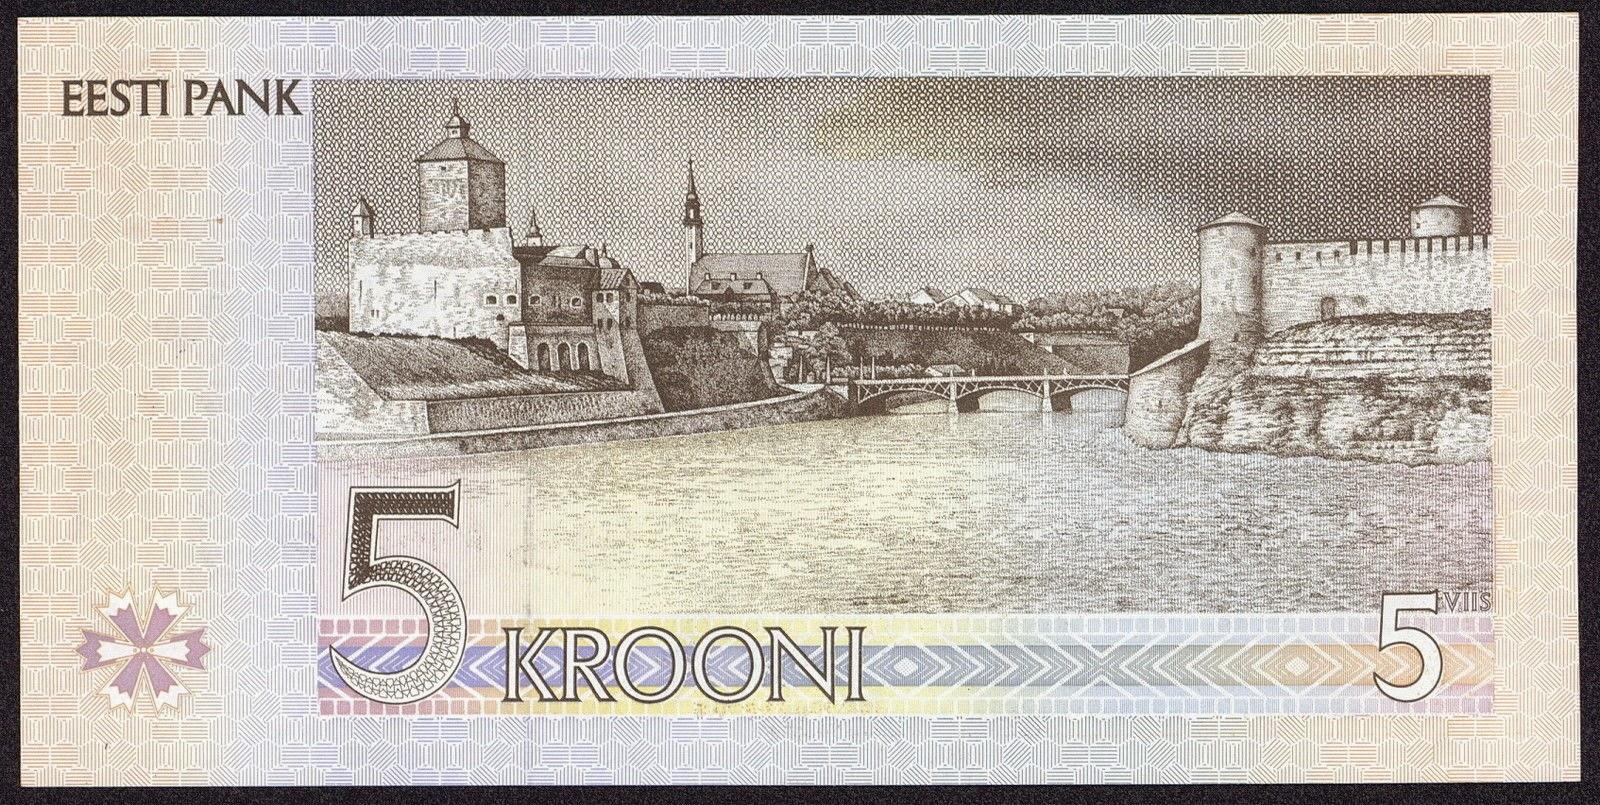 Estonia banknotes 5 krooni note, Narva Hermann Castle and Ivangorod Fortress